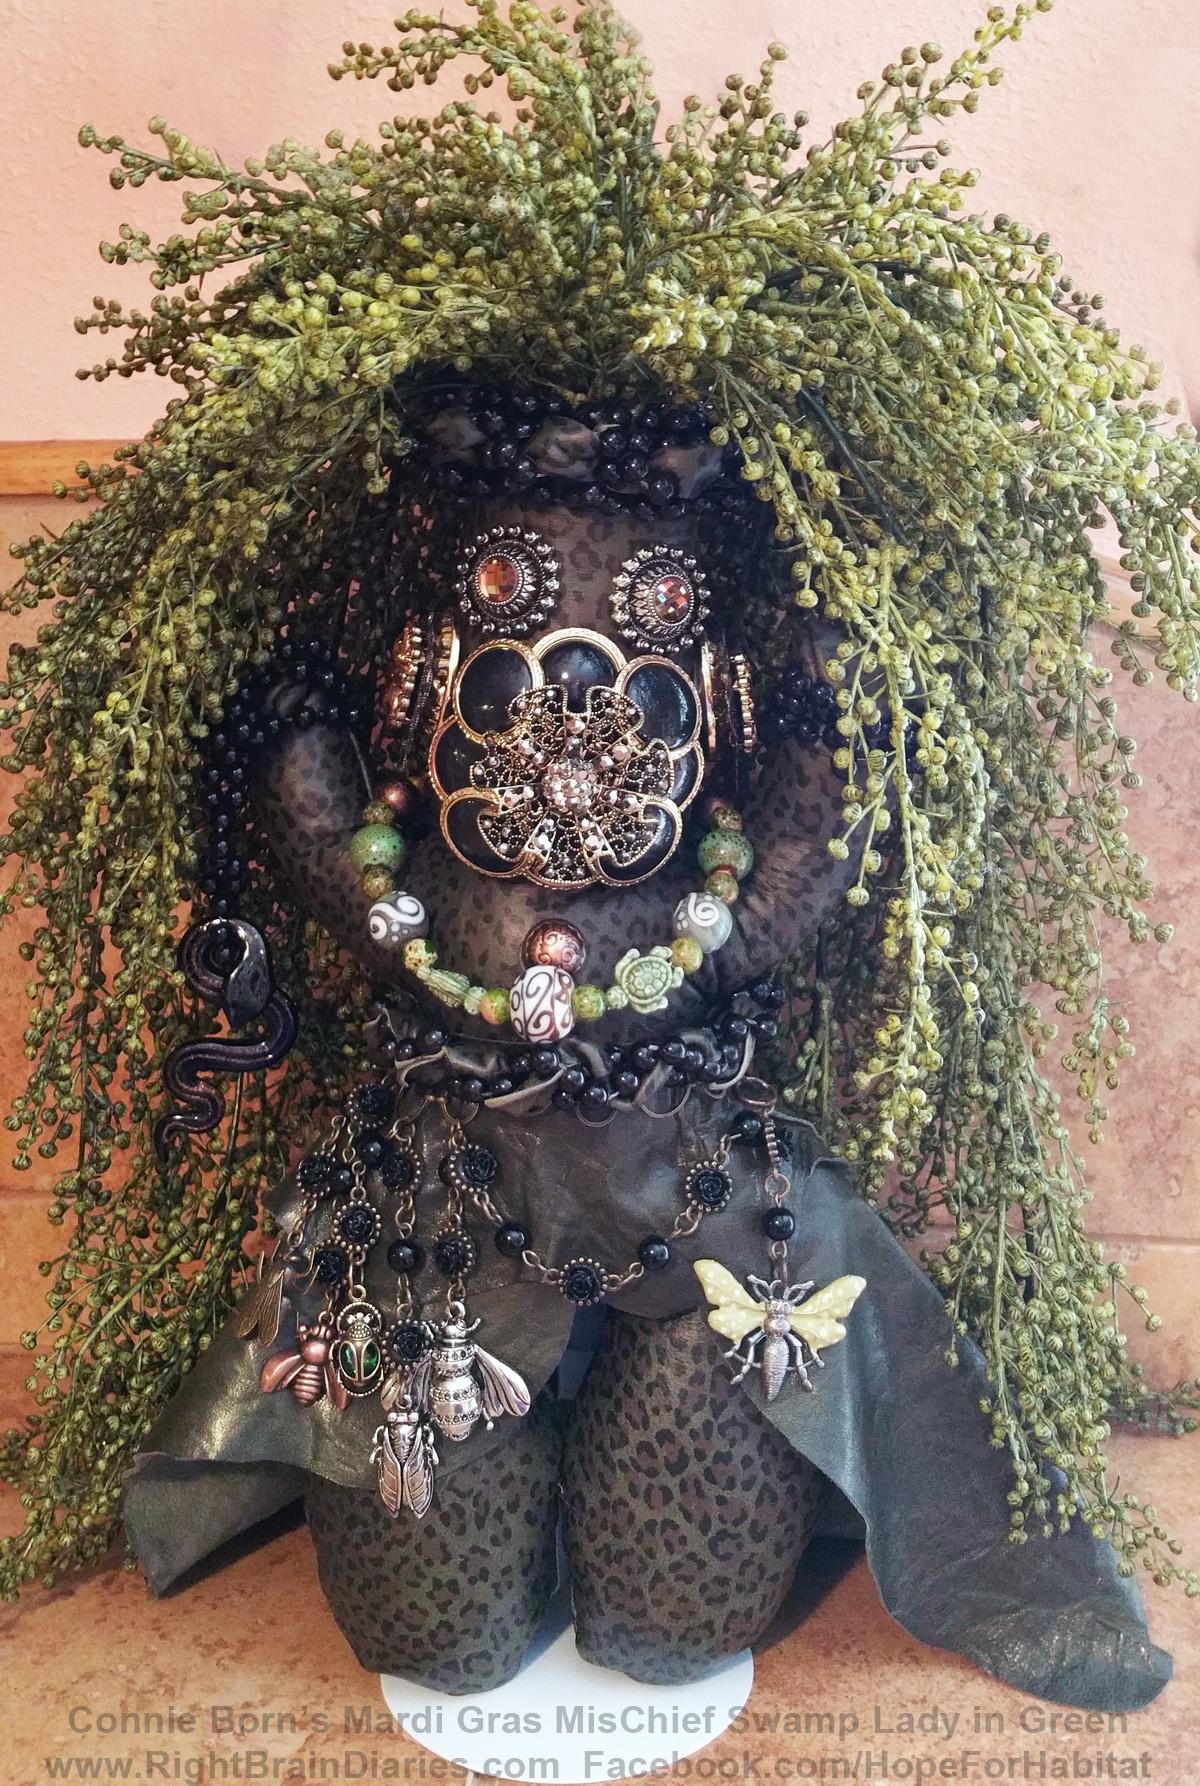 Mardi Gras MisChief Swamp People Lady in Green – Connie Born, artist